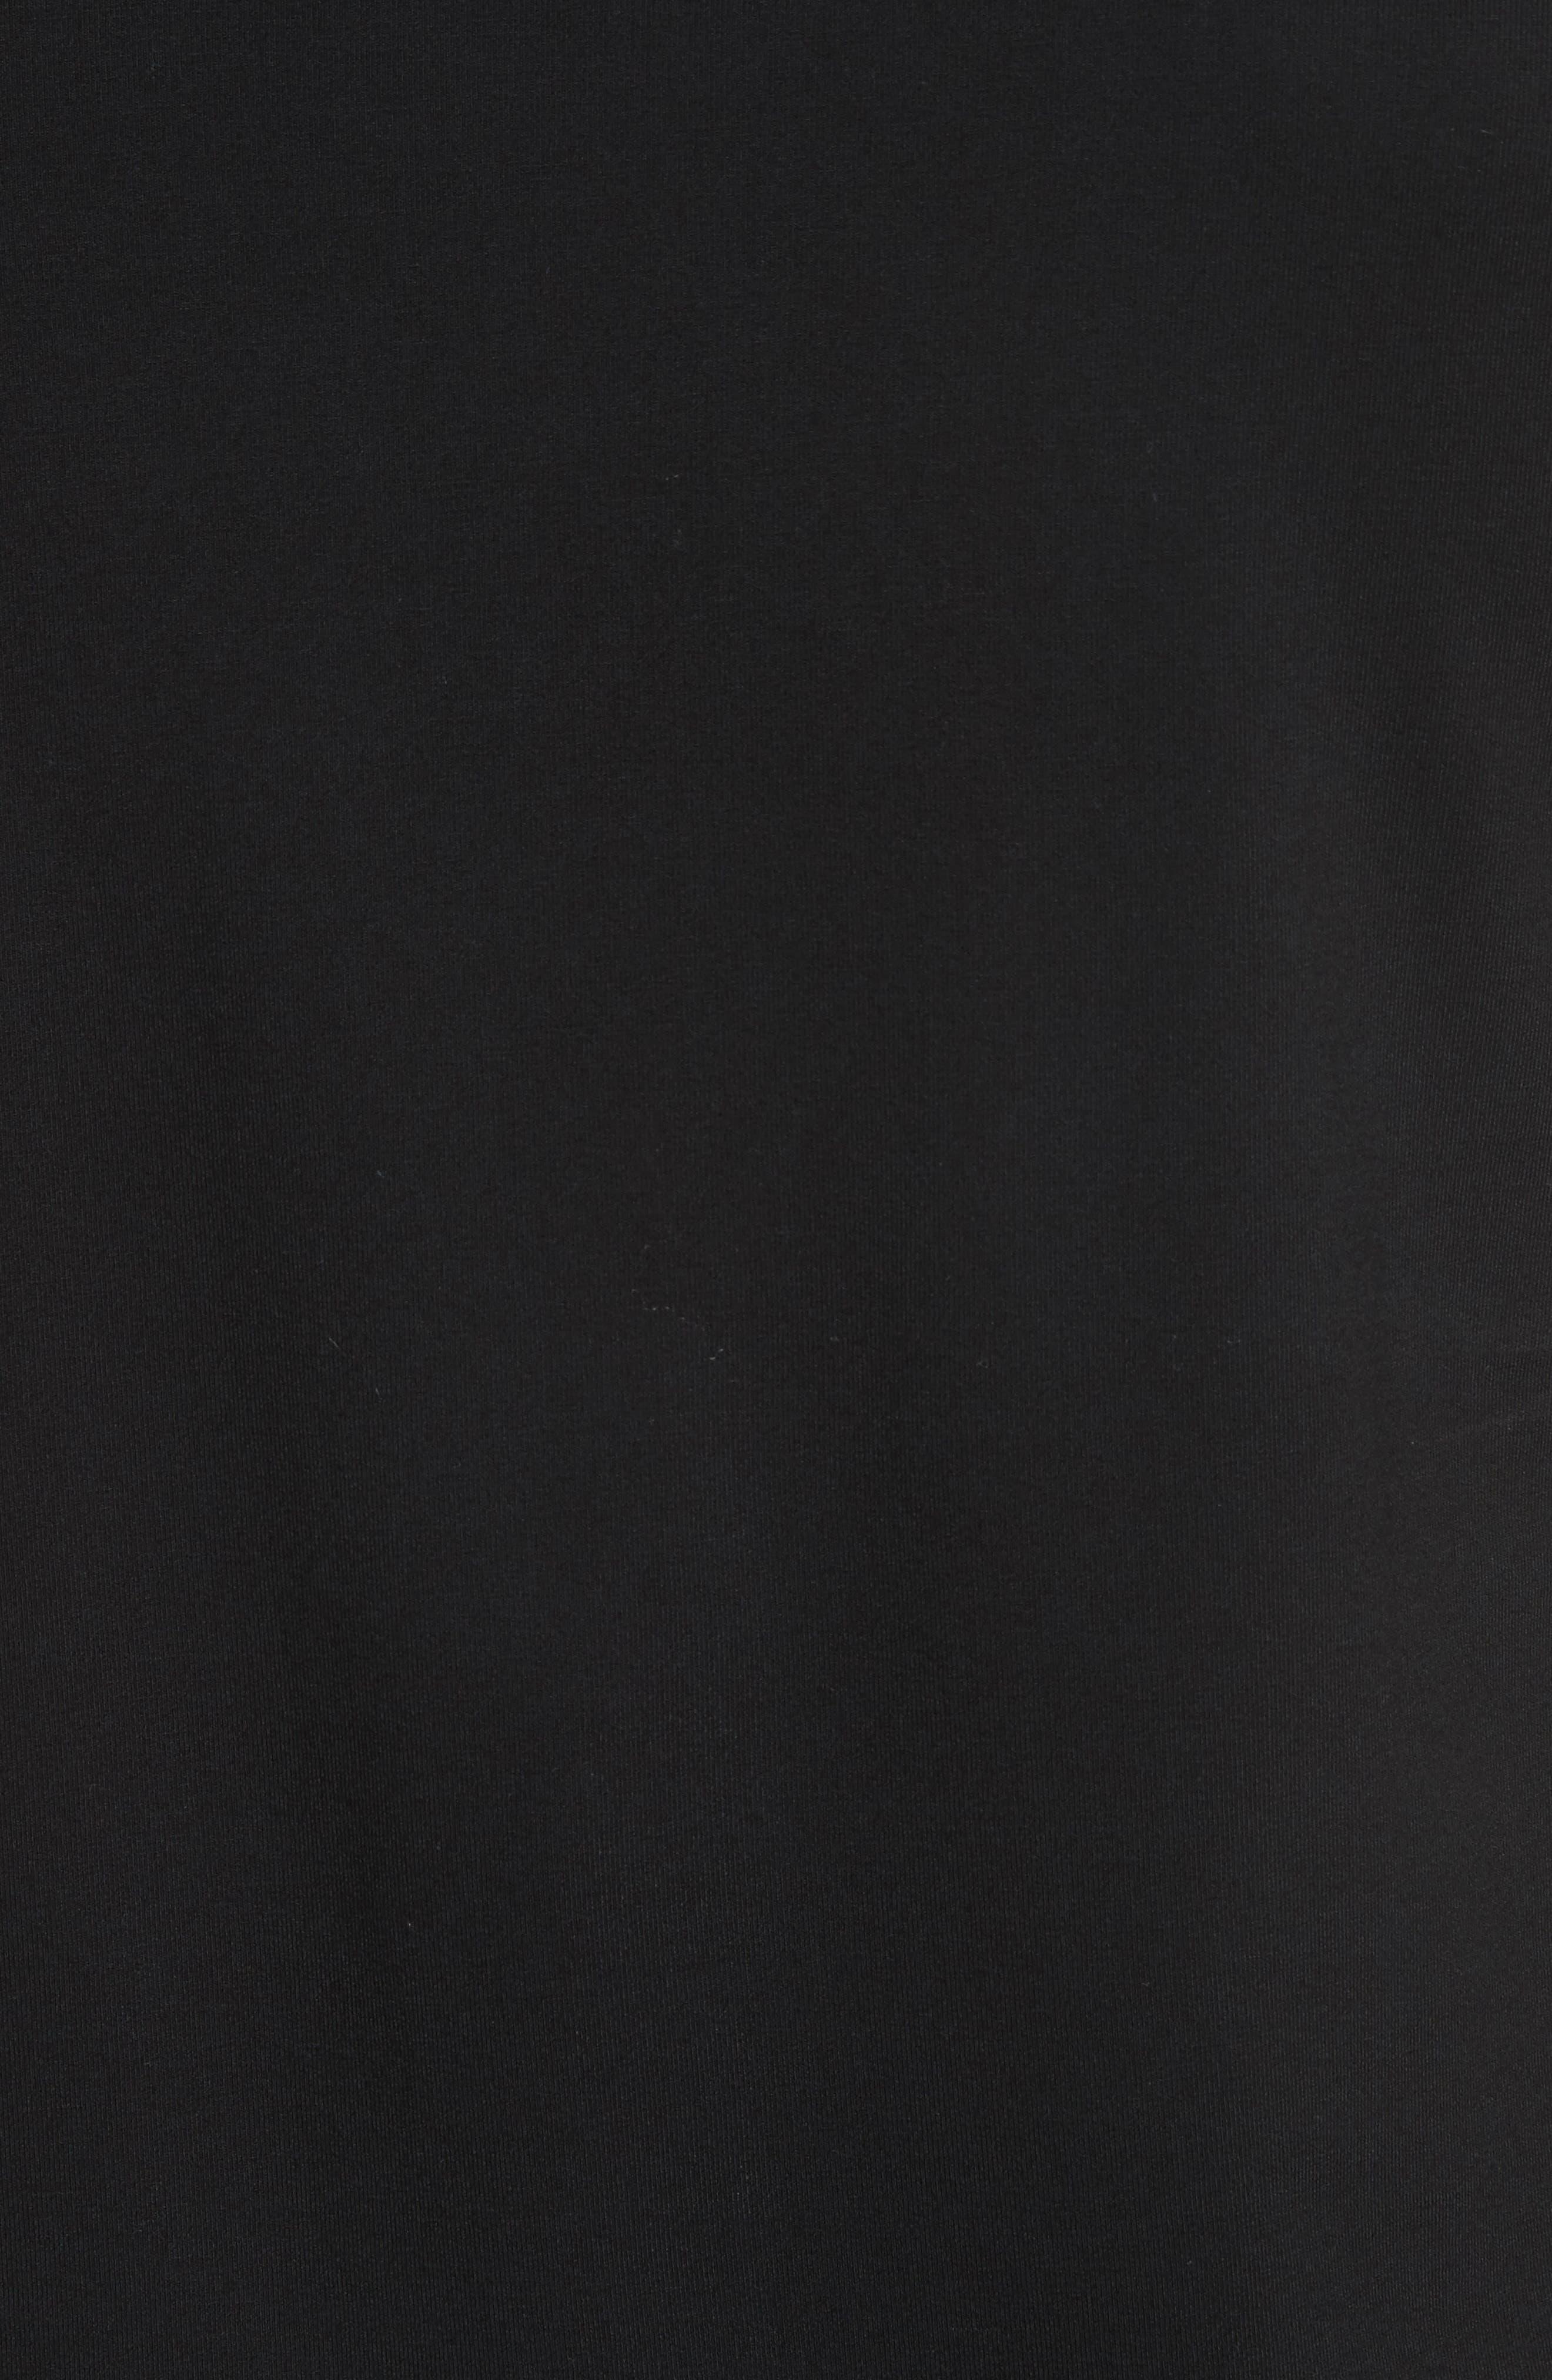 Slim Fit Stretch Crewneck T-Shirt,                             Alternate thumbnail 5, color,                             SOLID BLACK